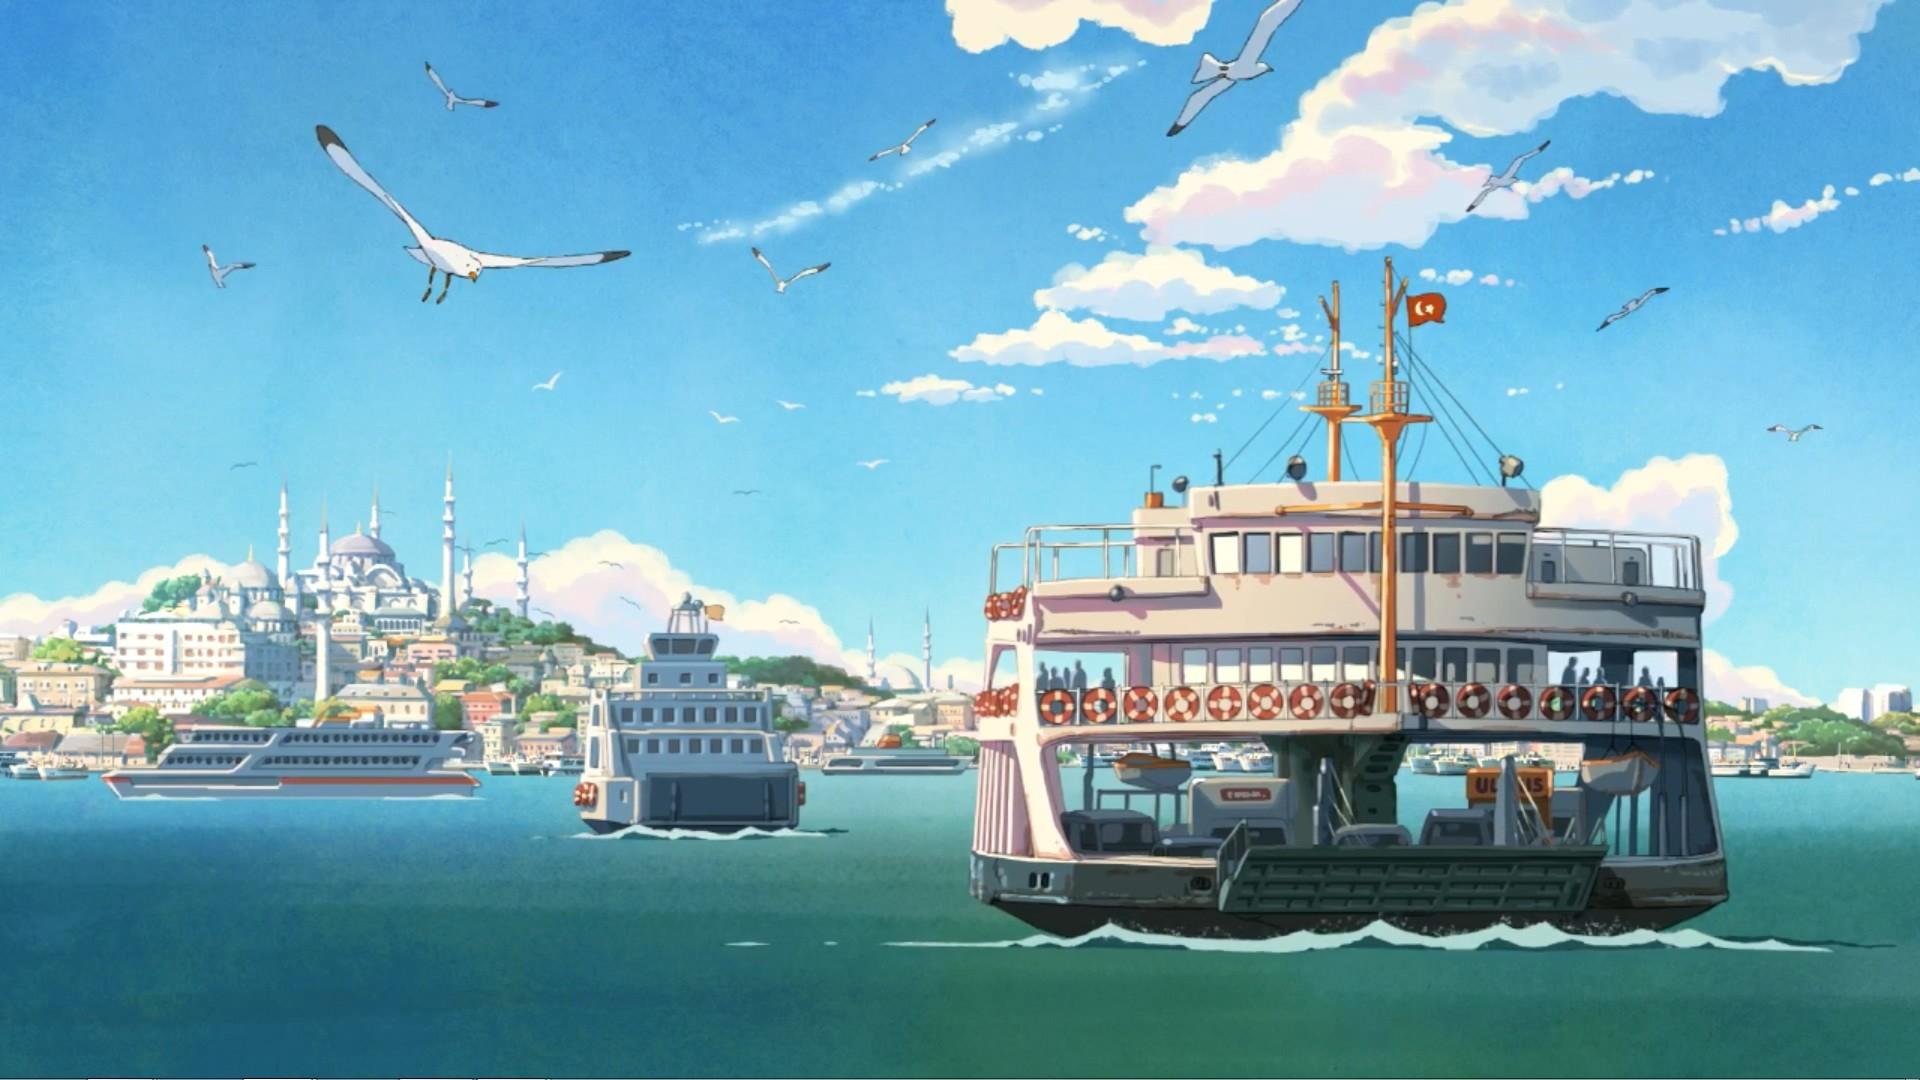 Anime Scenery · Scenery WallpaperHd WallpaperAnimation …